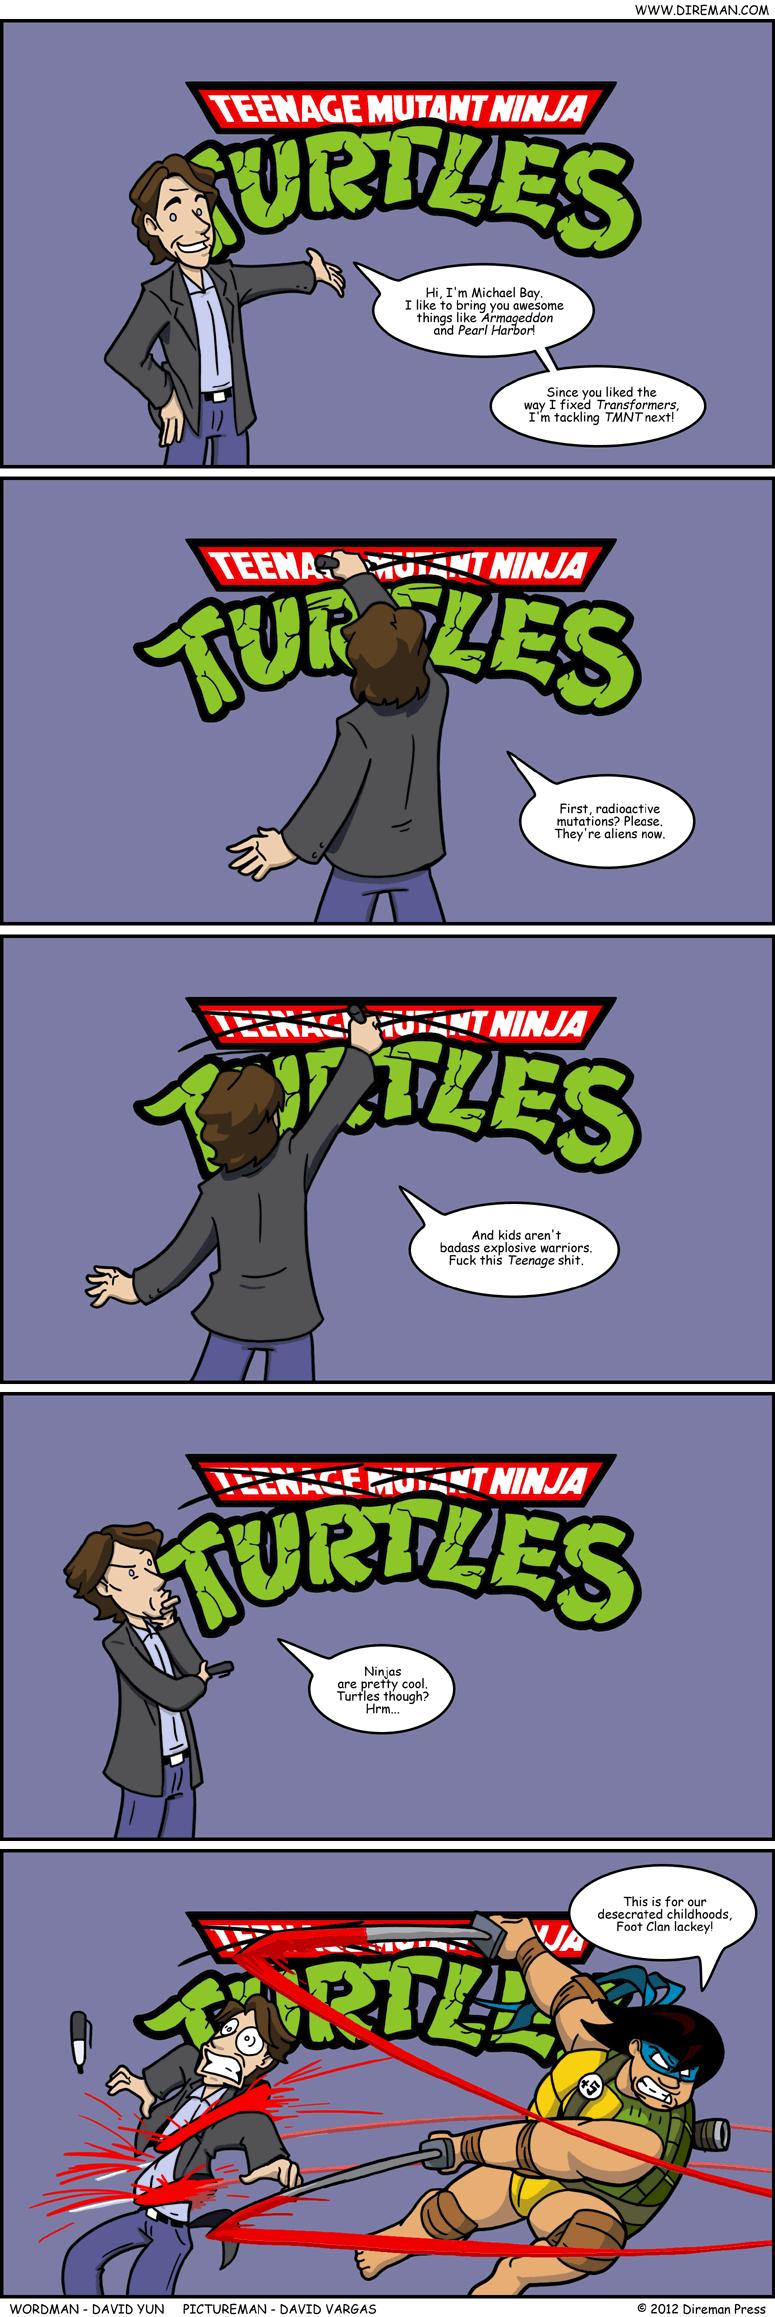 X X Ninja Turtles